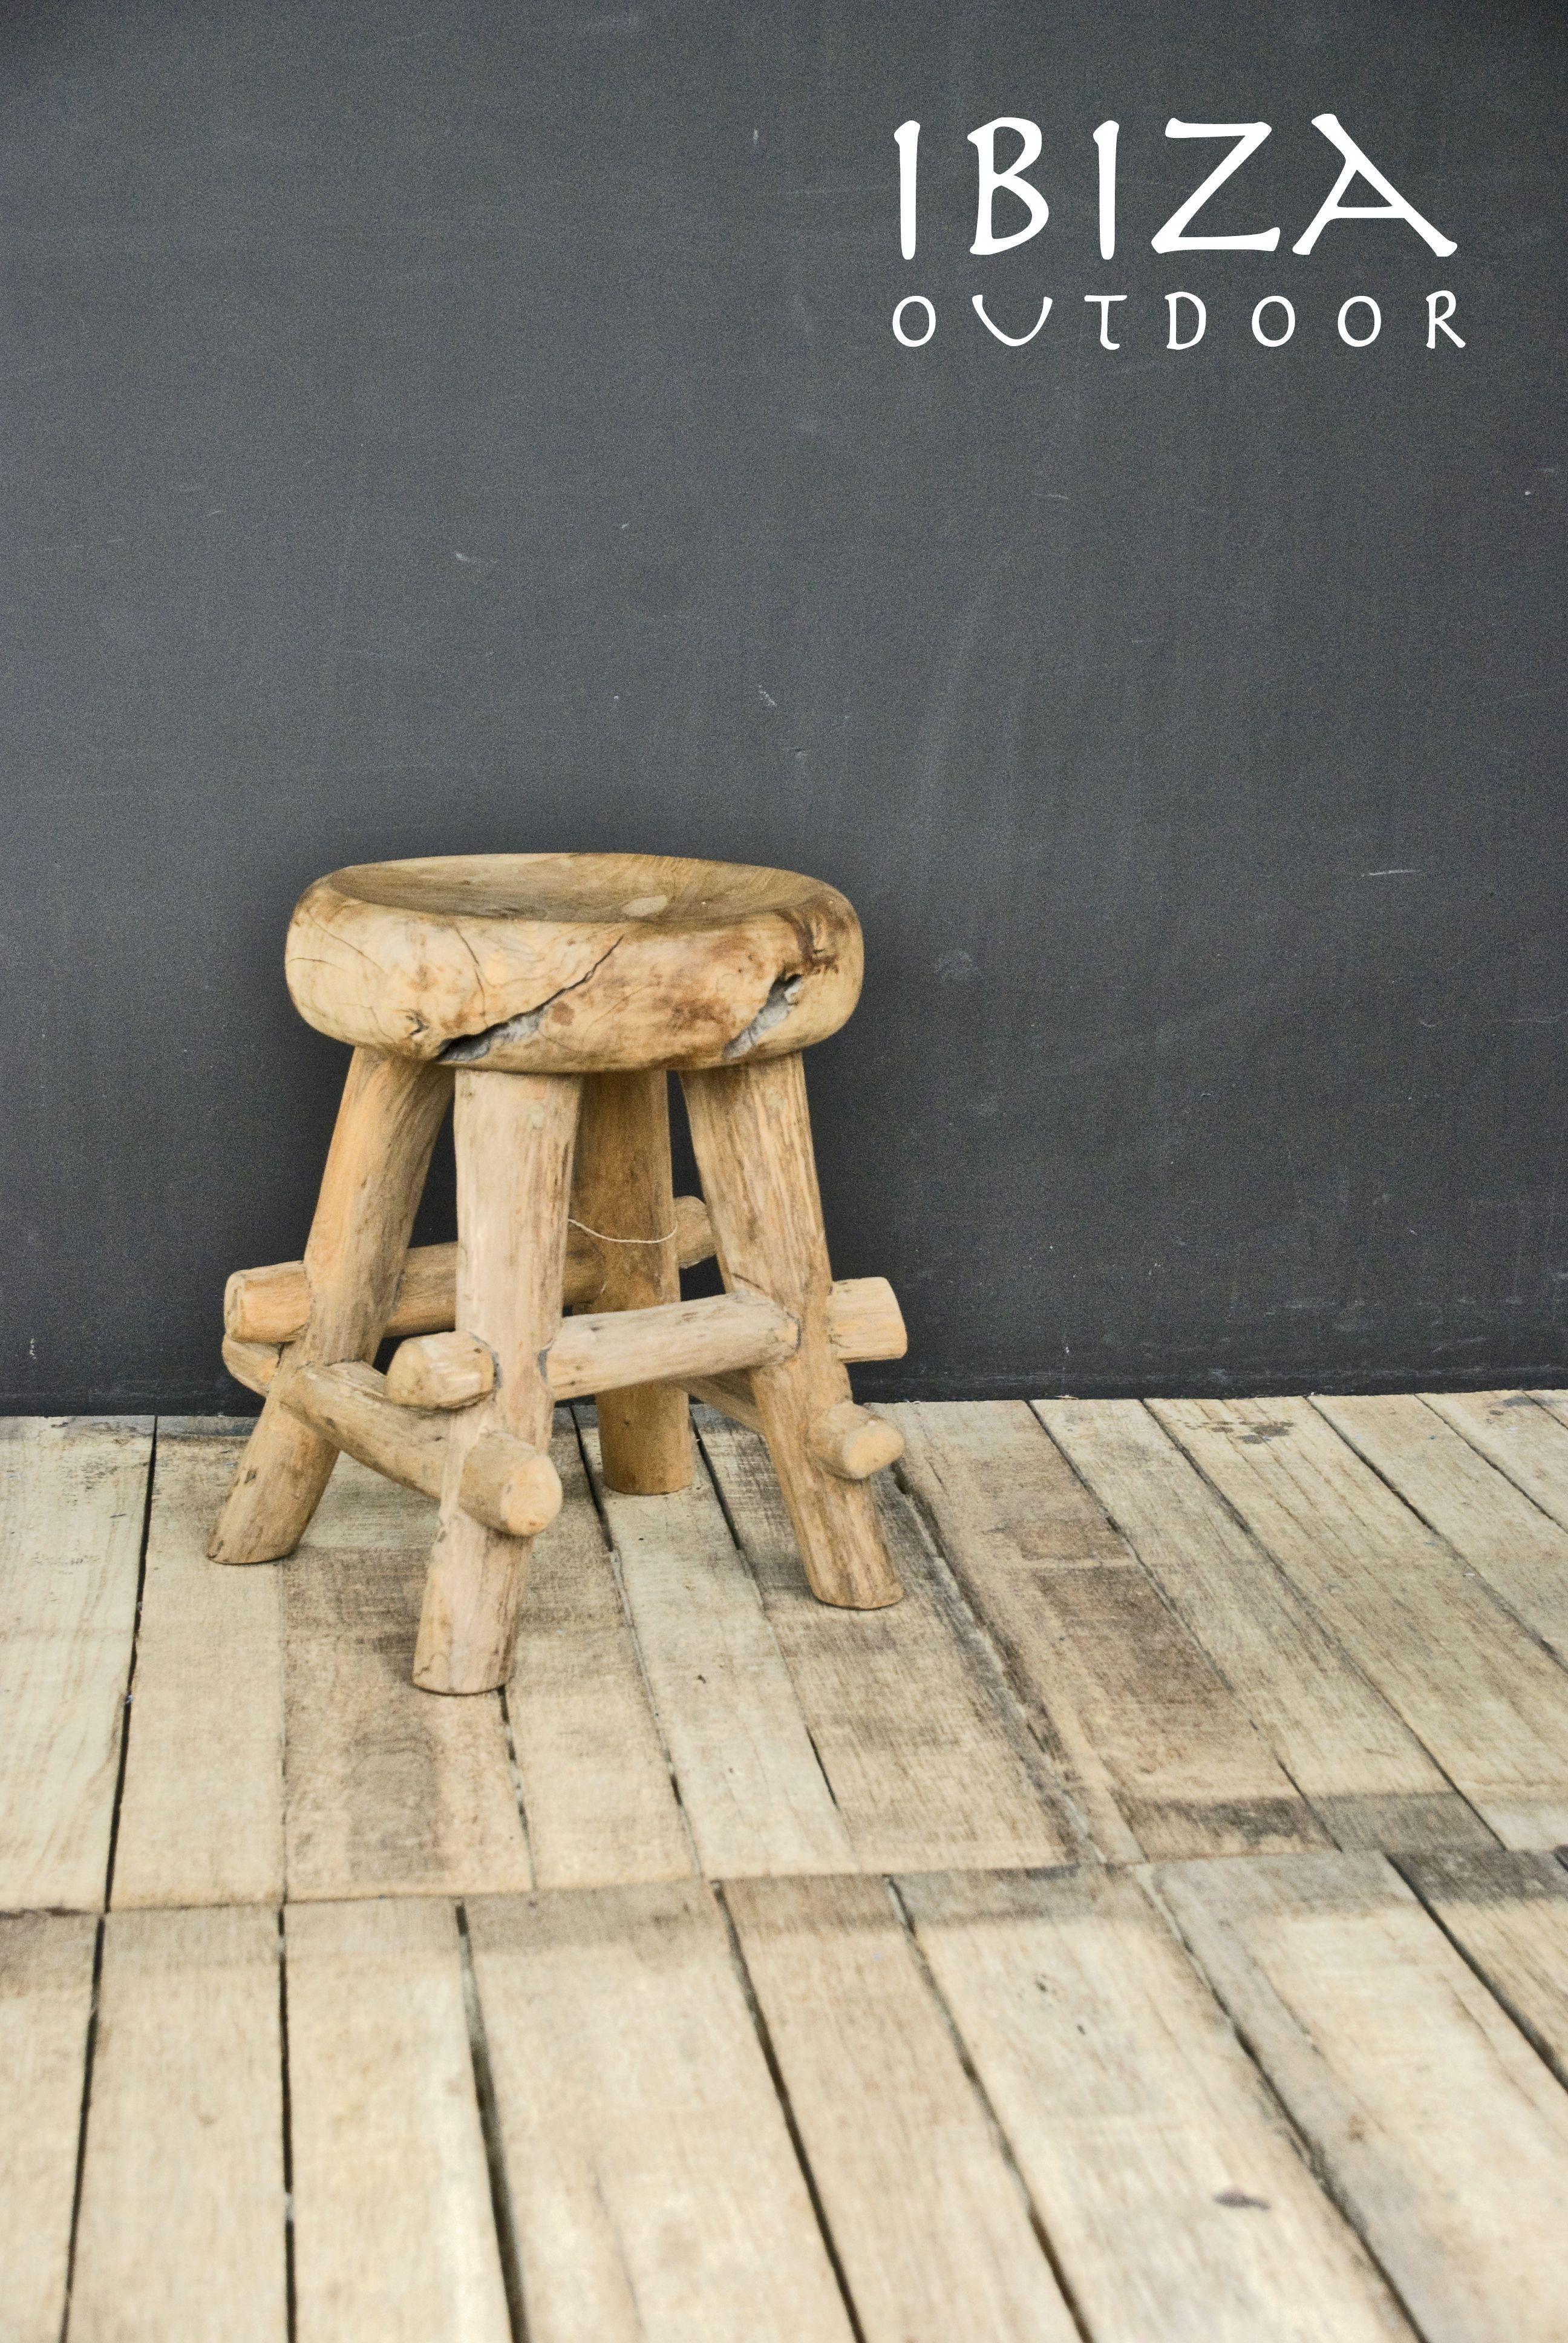 Stupendous A Teak Wooden Small Stool Nice As Decoration Piece In The Creativecarmelina Interior Chair Design Creativecarmelinacom